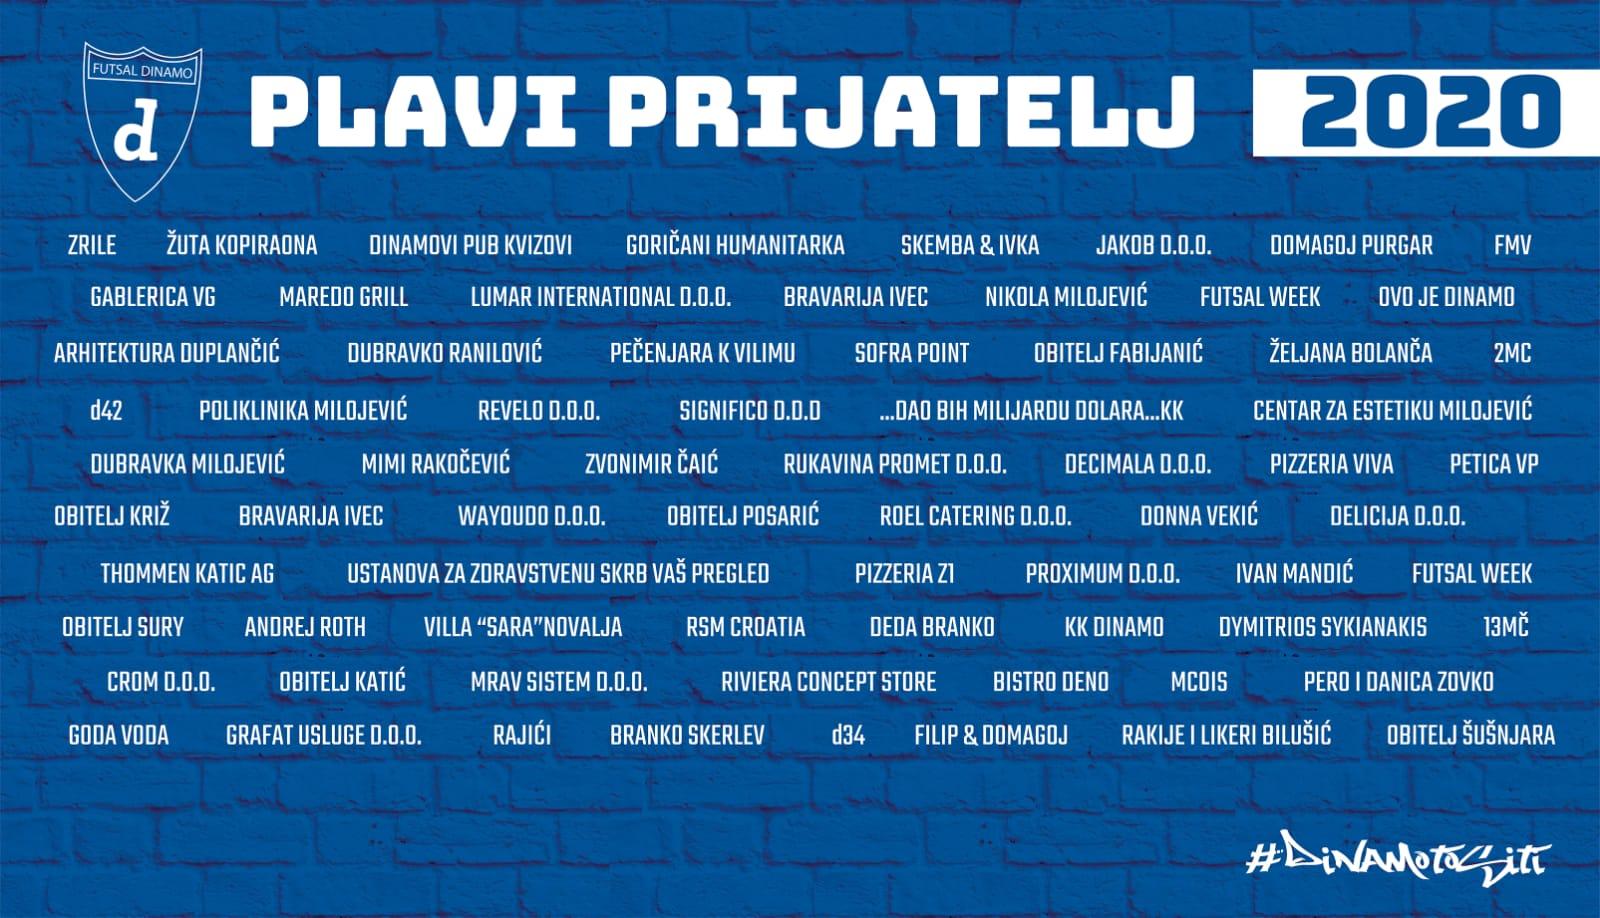 Plavi zid Futsal Dinama